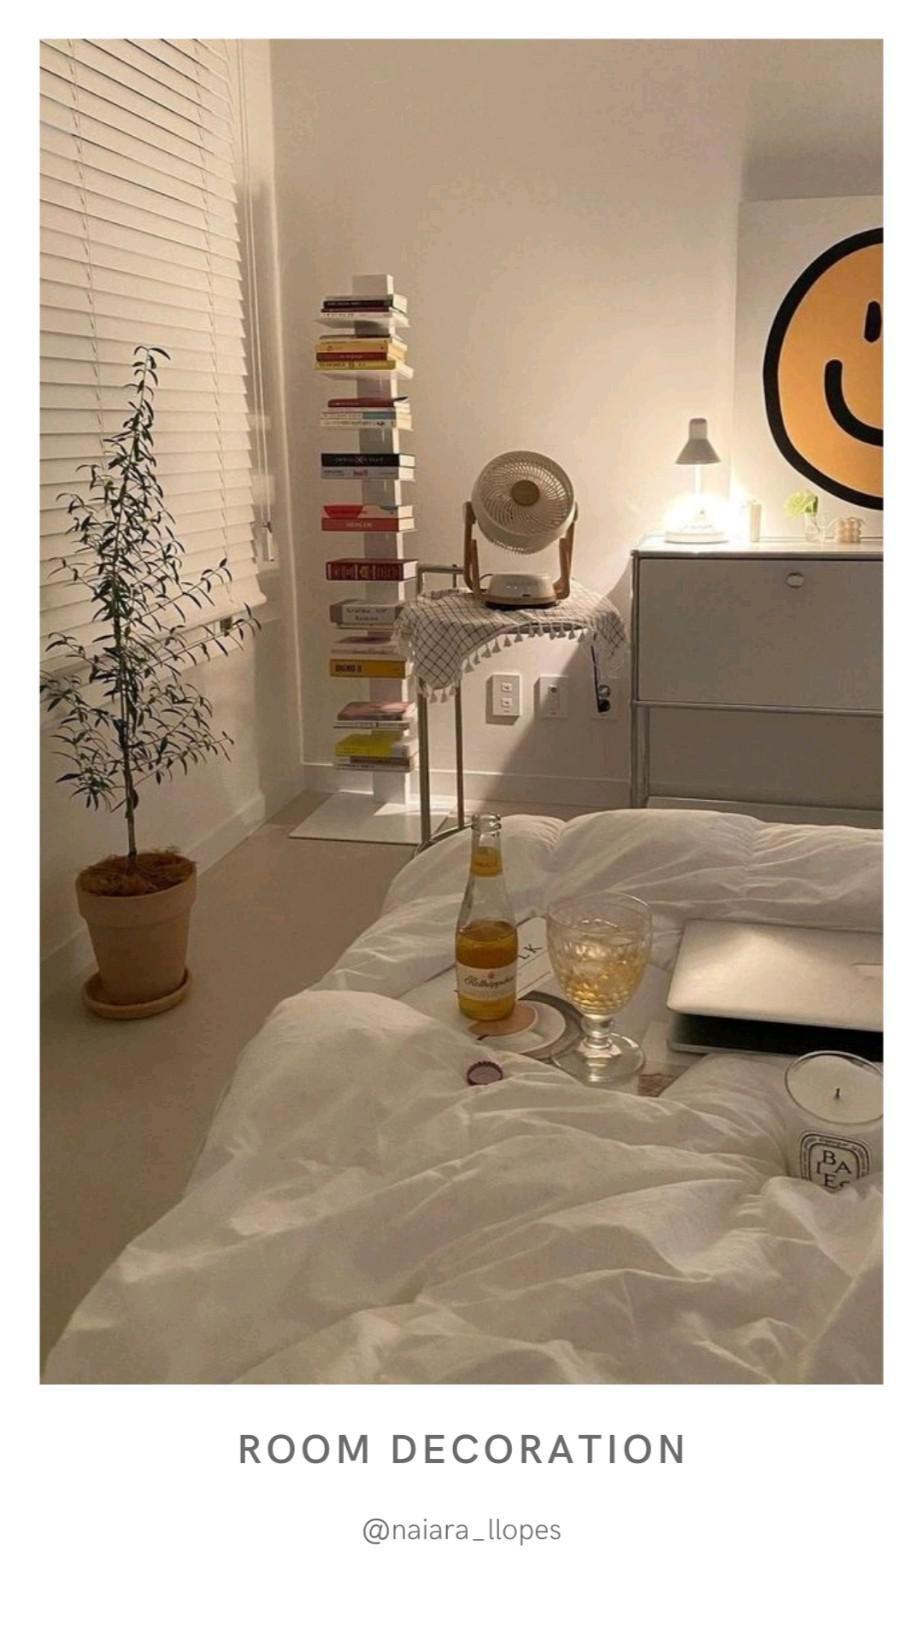 ✨ROOM DECORATION✨ #room #aesthetic #roomaesthetic #moda #trend #decoration #decor #fashion